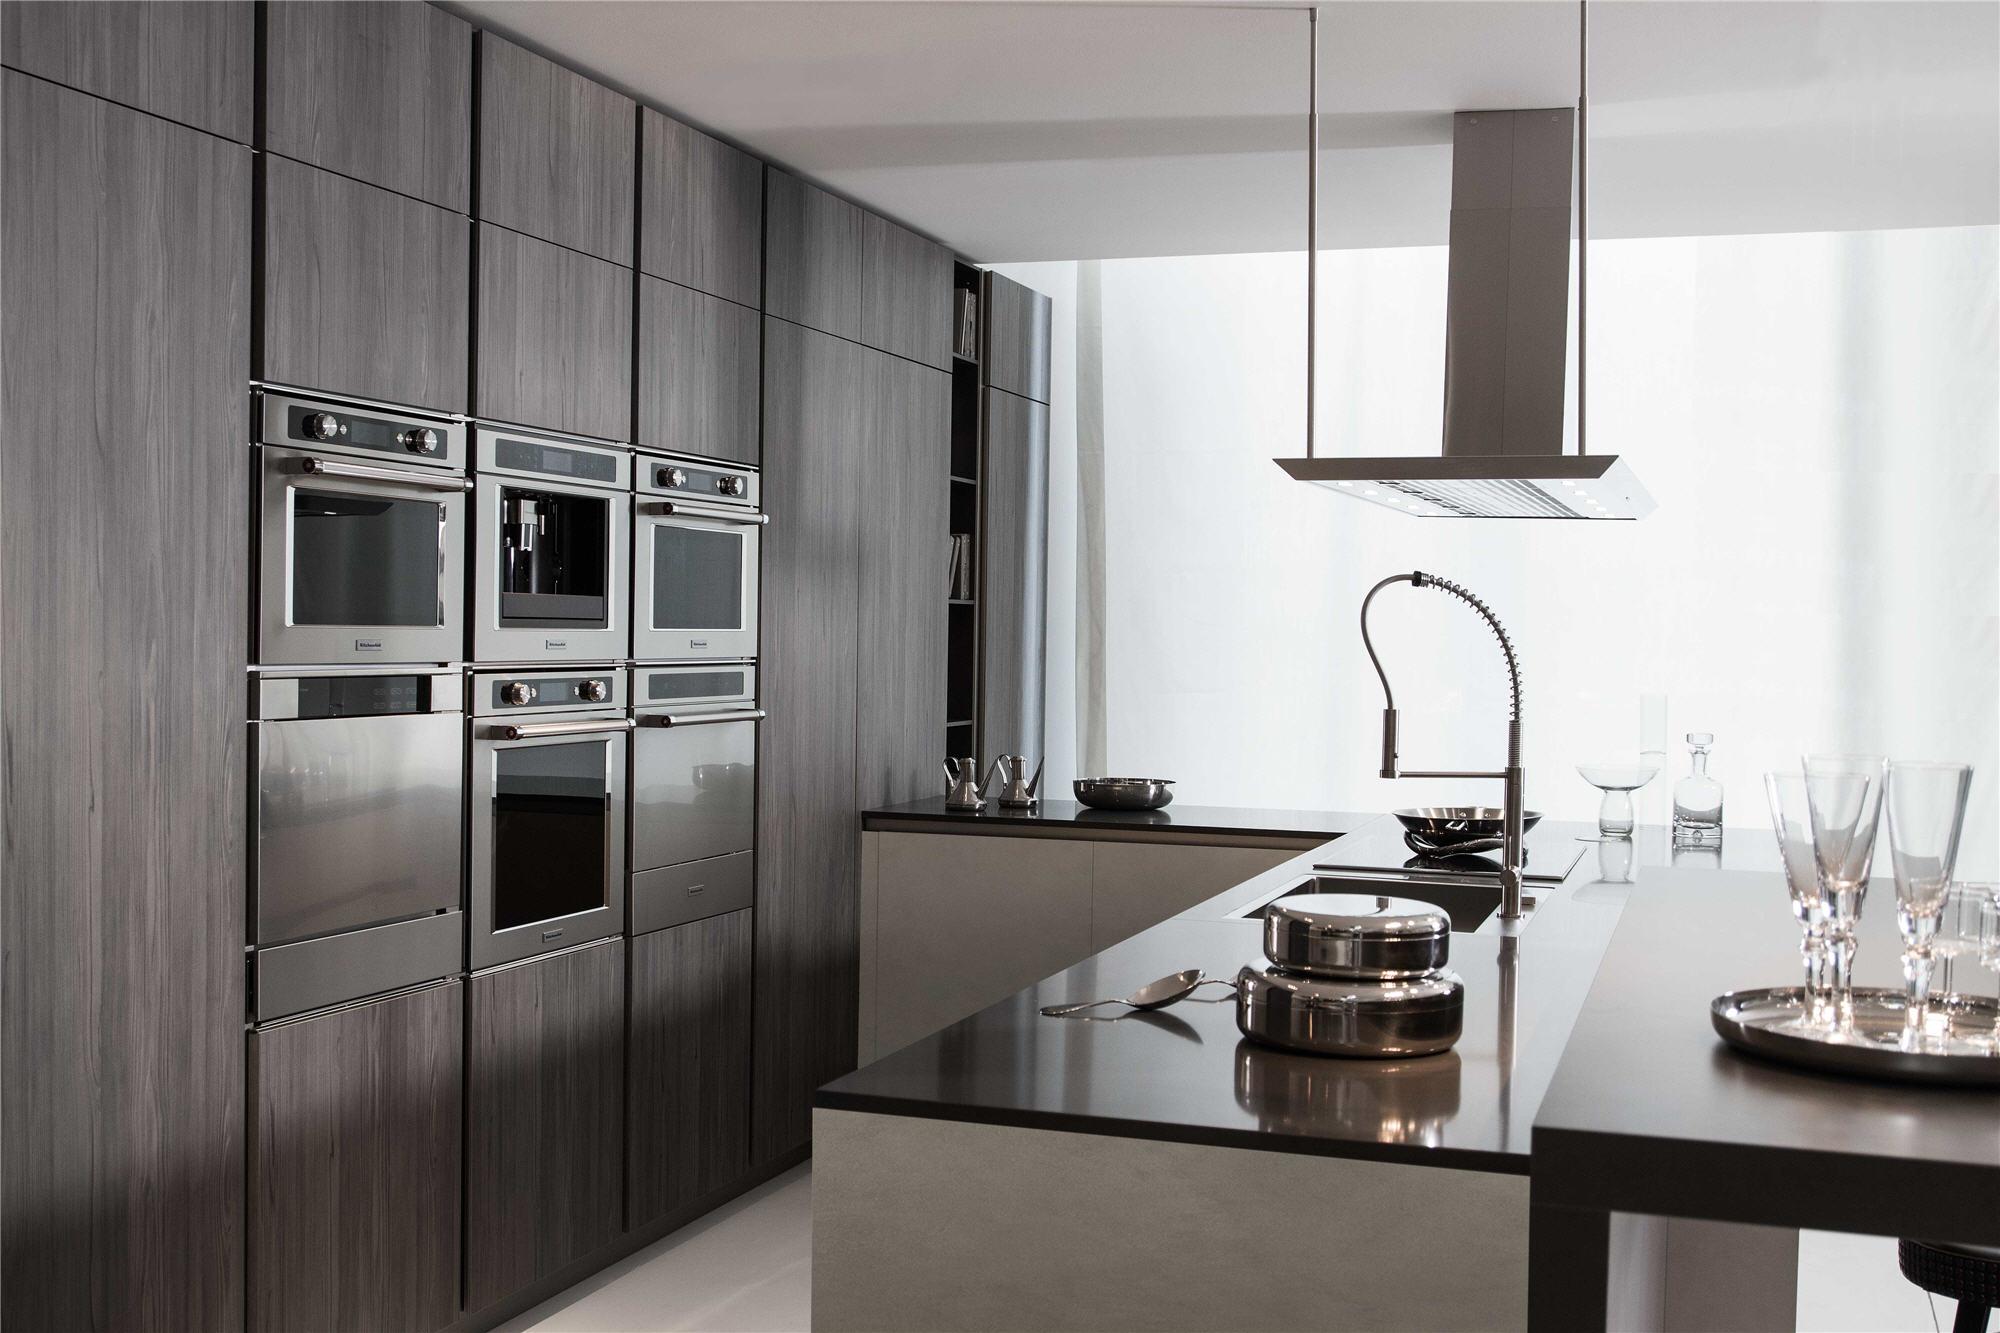 cucina-Way-nobilitato-resina-cenere-3